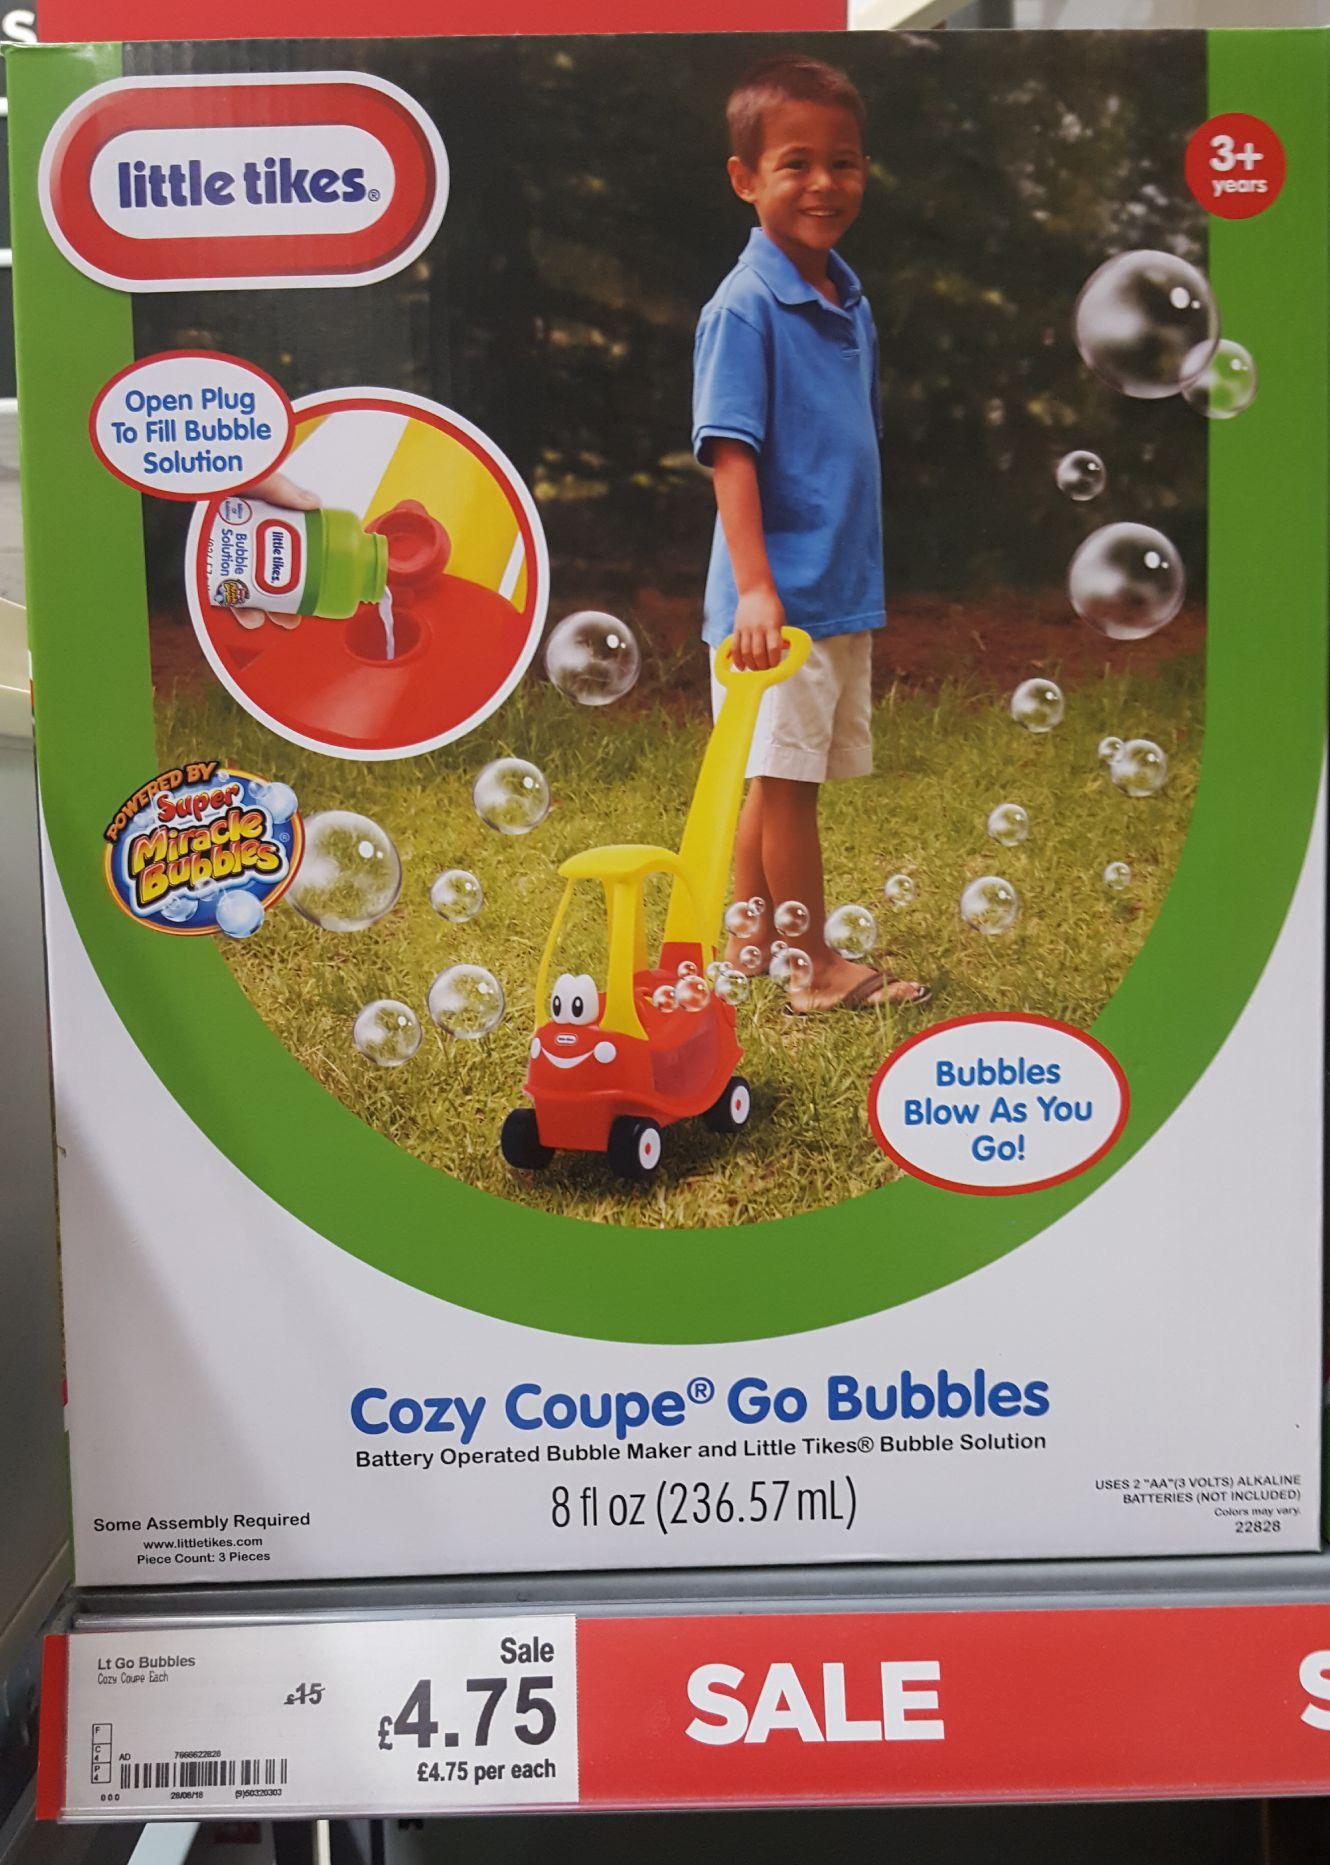 Cozy Coupe Go Bubbles Asda £4.75 instore (Govan)